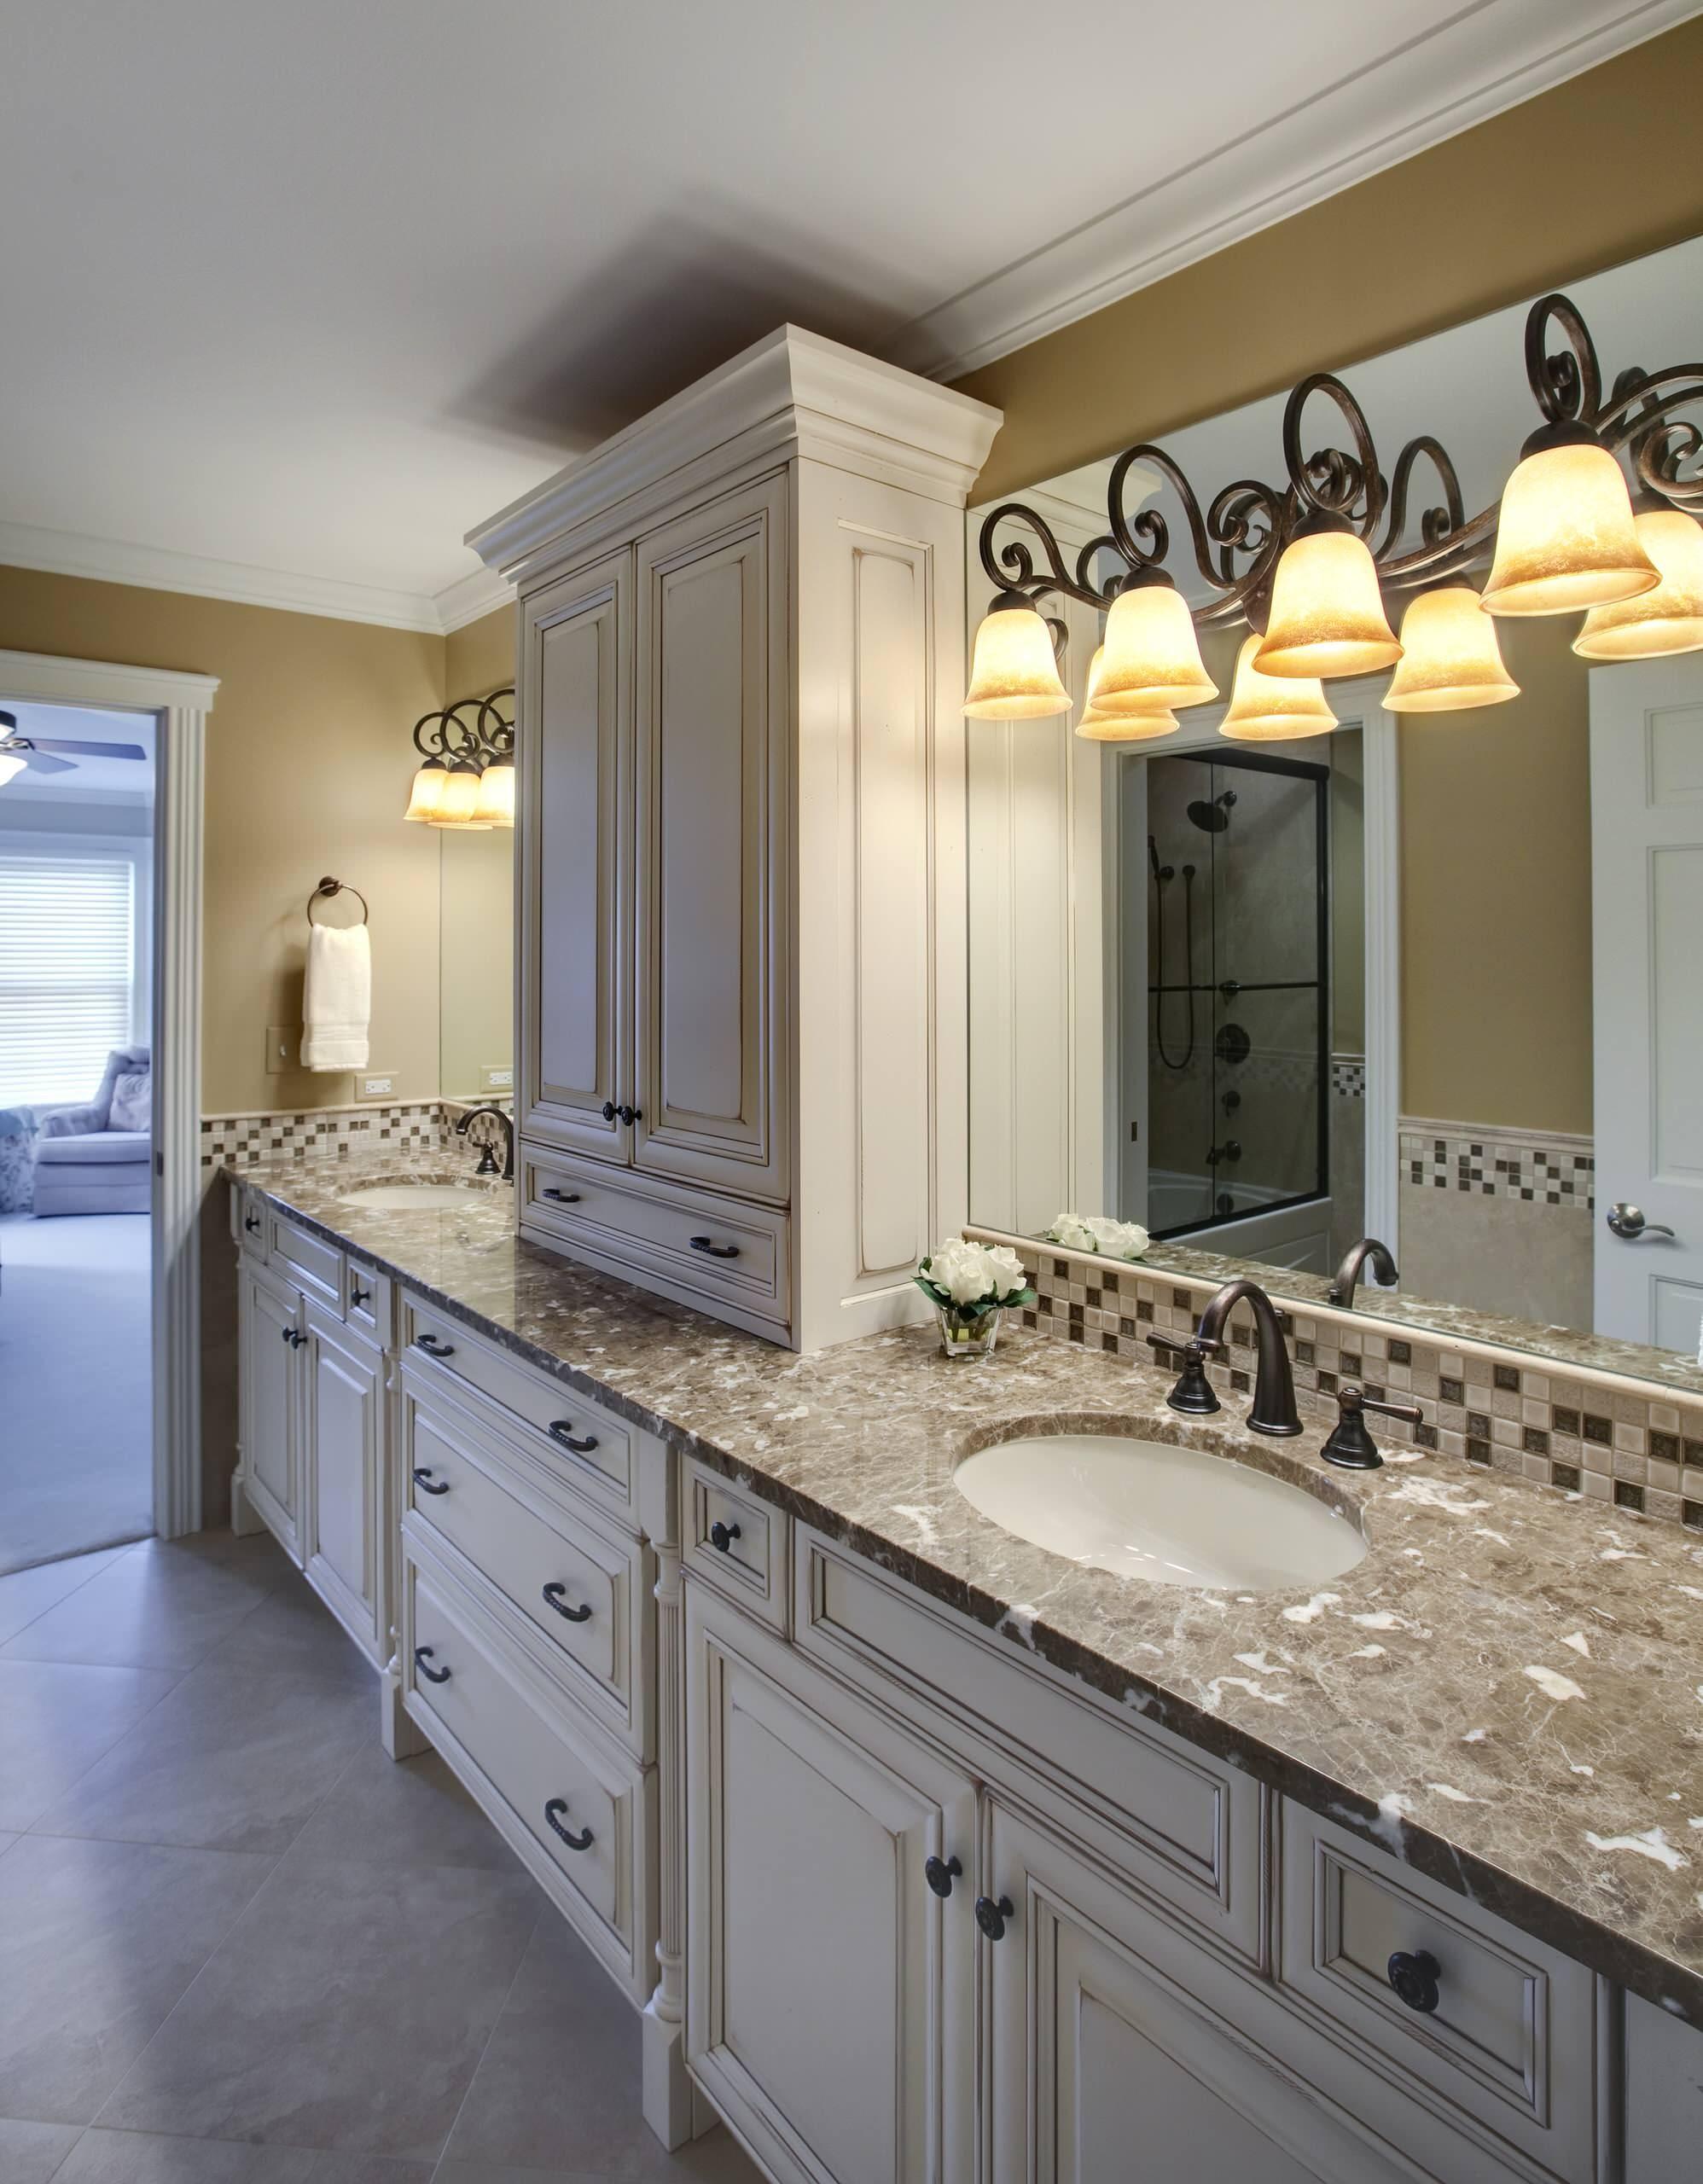 Charmant Bathroom Vanity With Tower